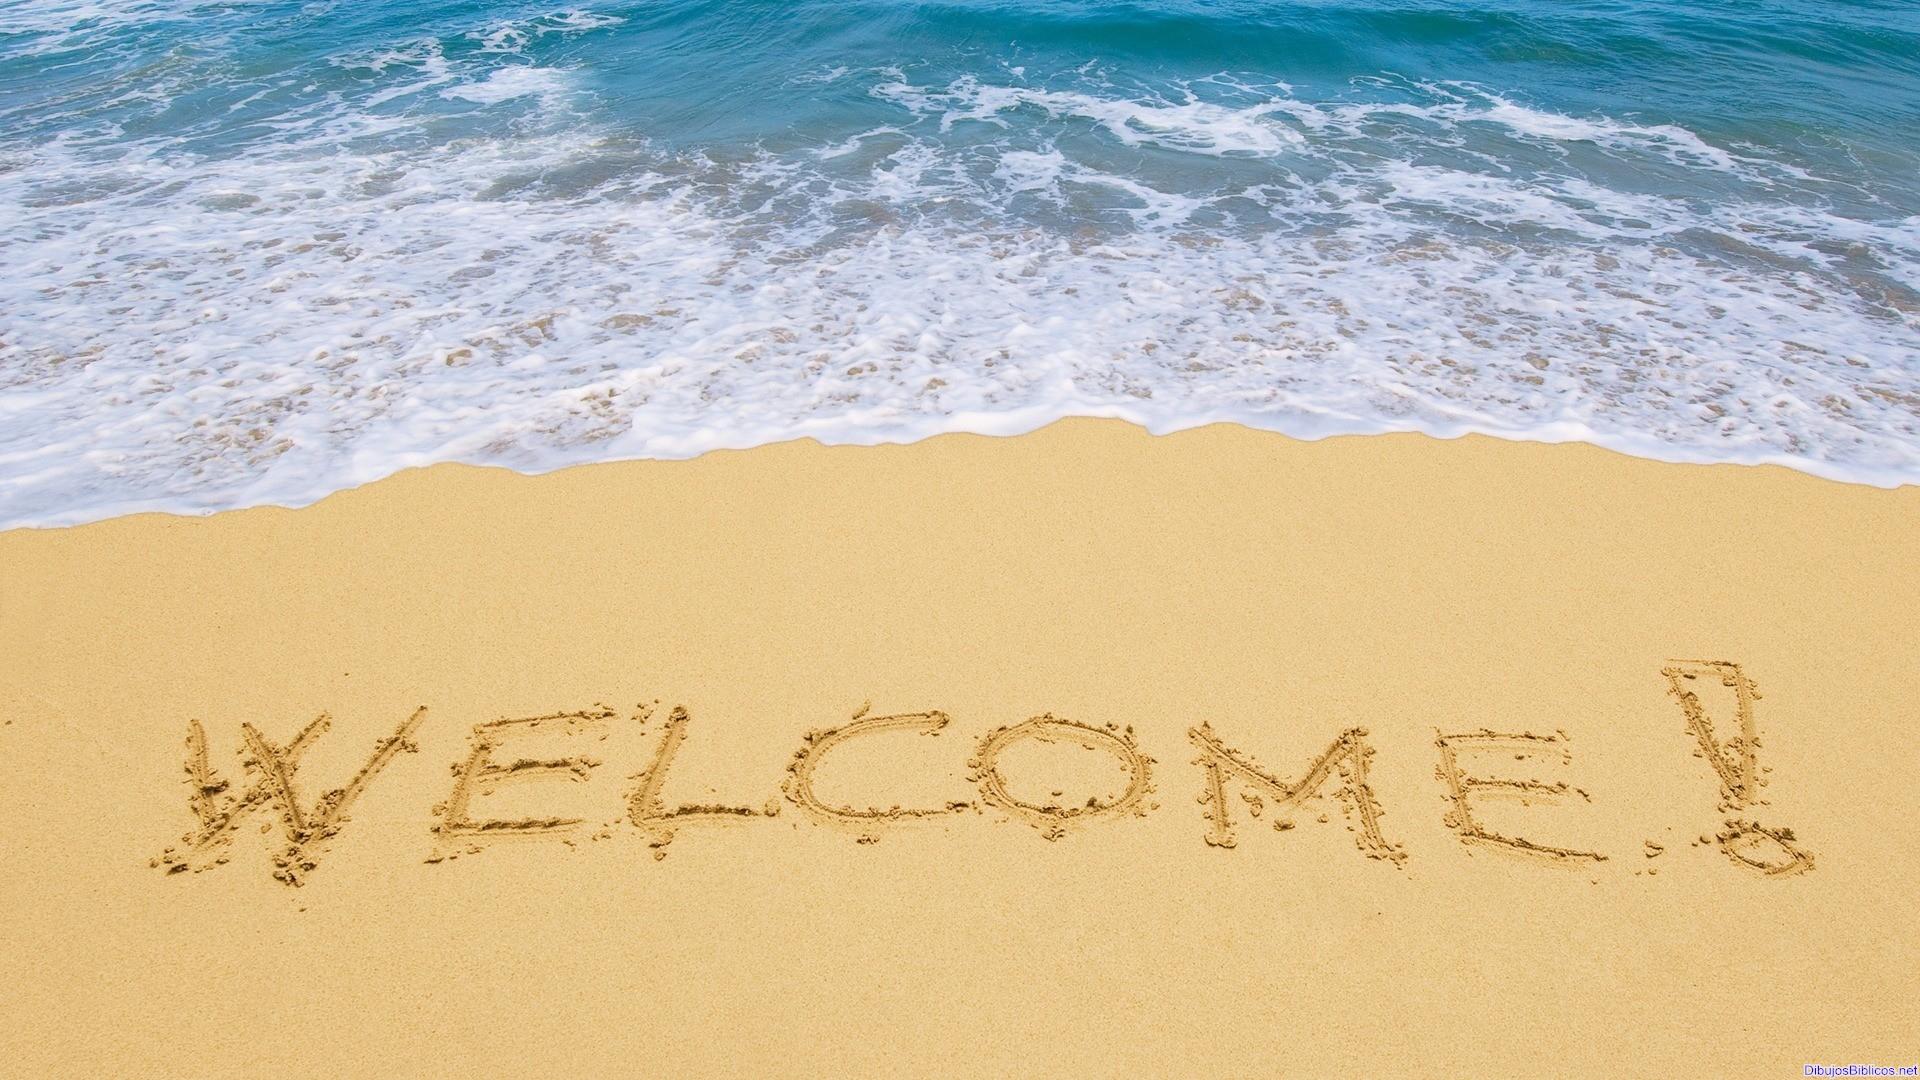 Welcome_Bienvenido_en_ingles-16492.jpg